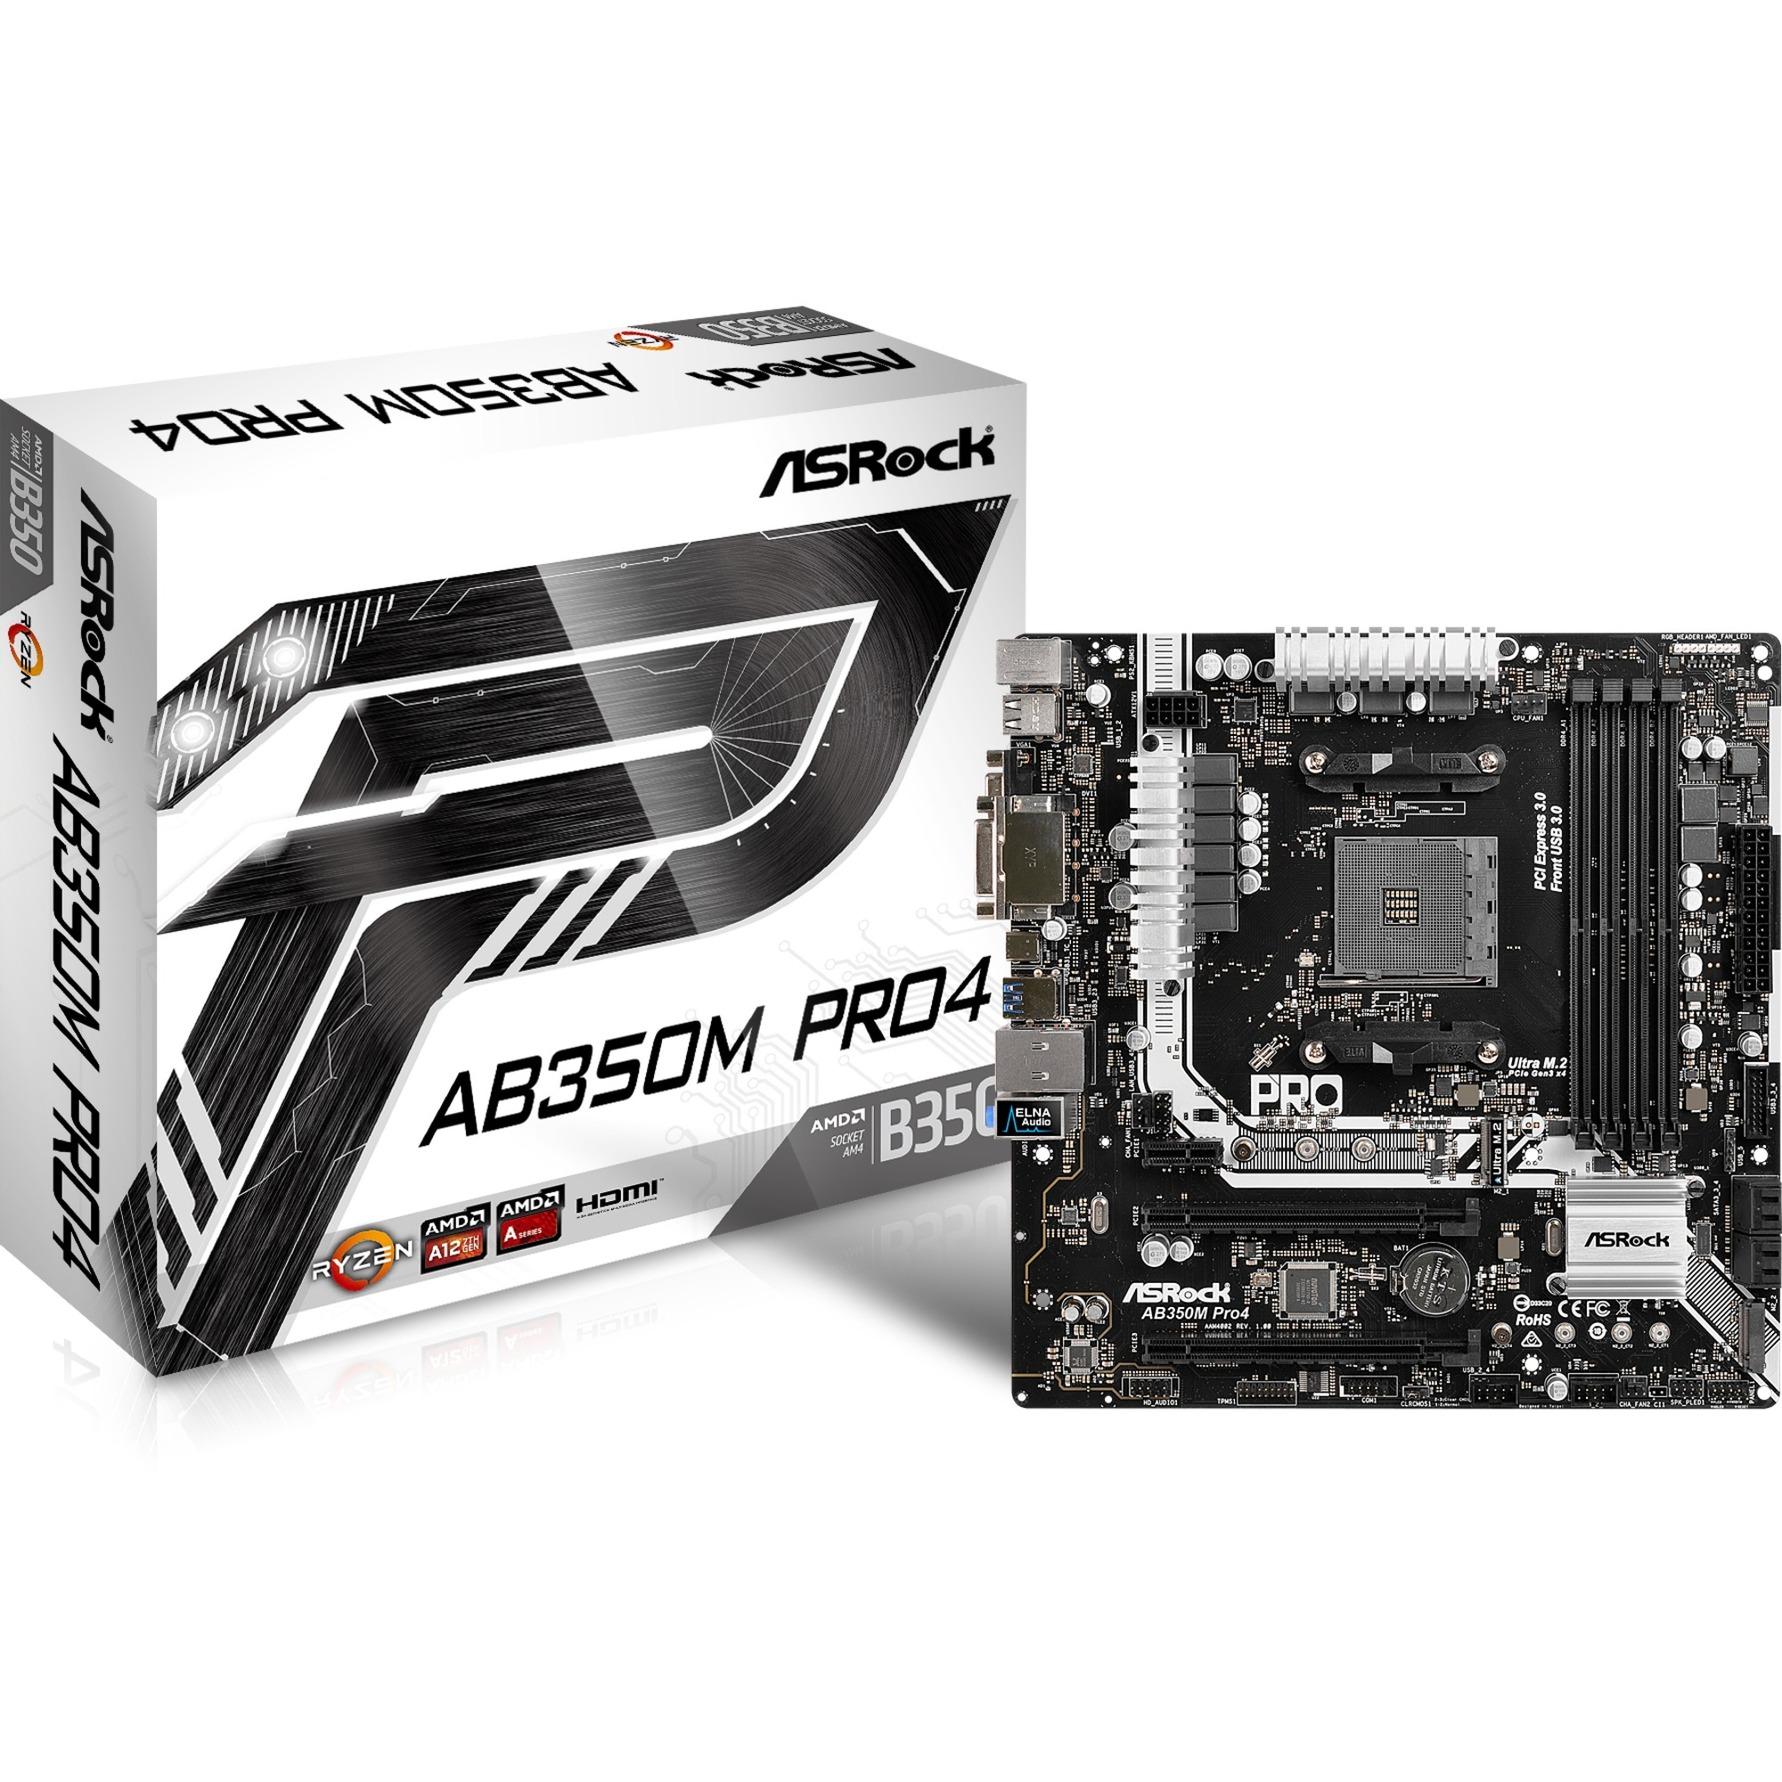 AB350M Pro4 AMD B350 Zócalo AM4 Micro ATX, Placa base